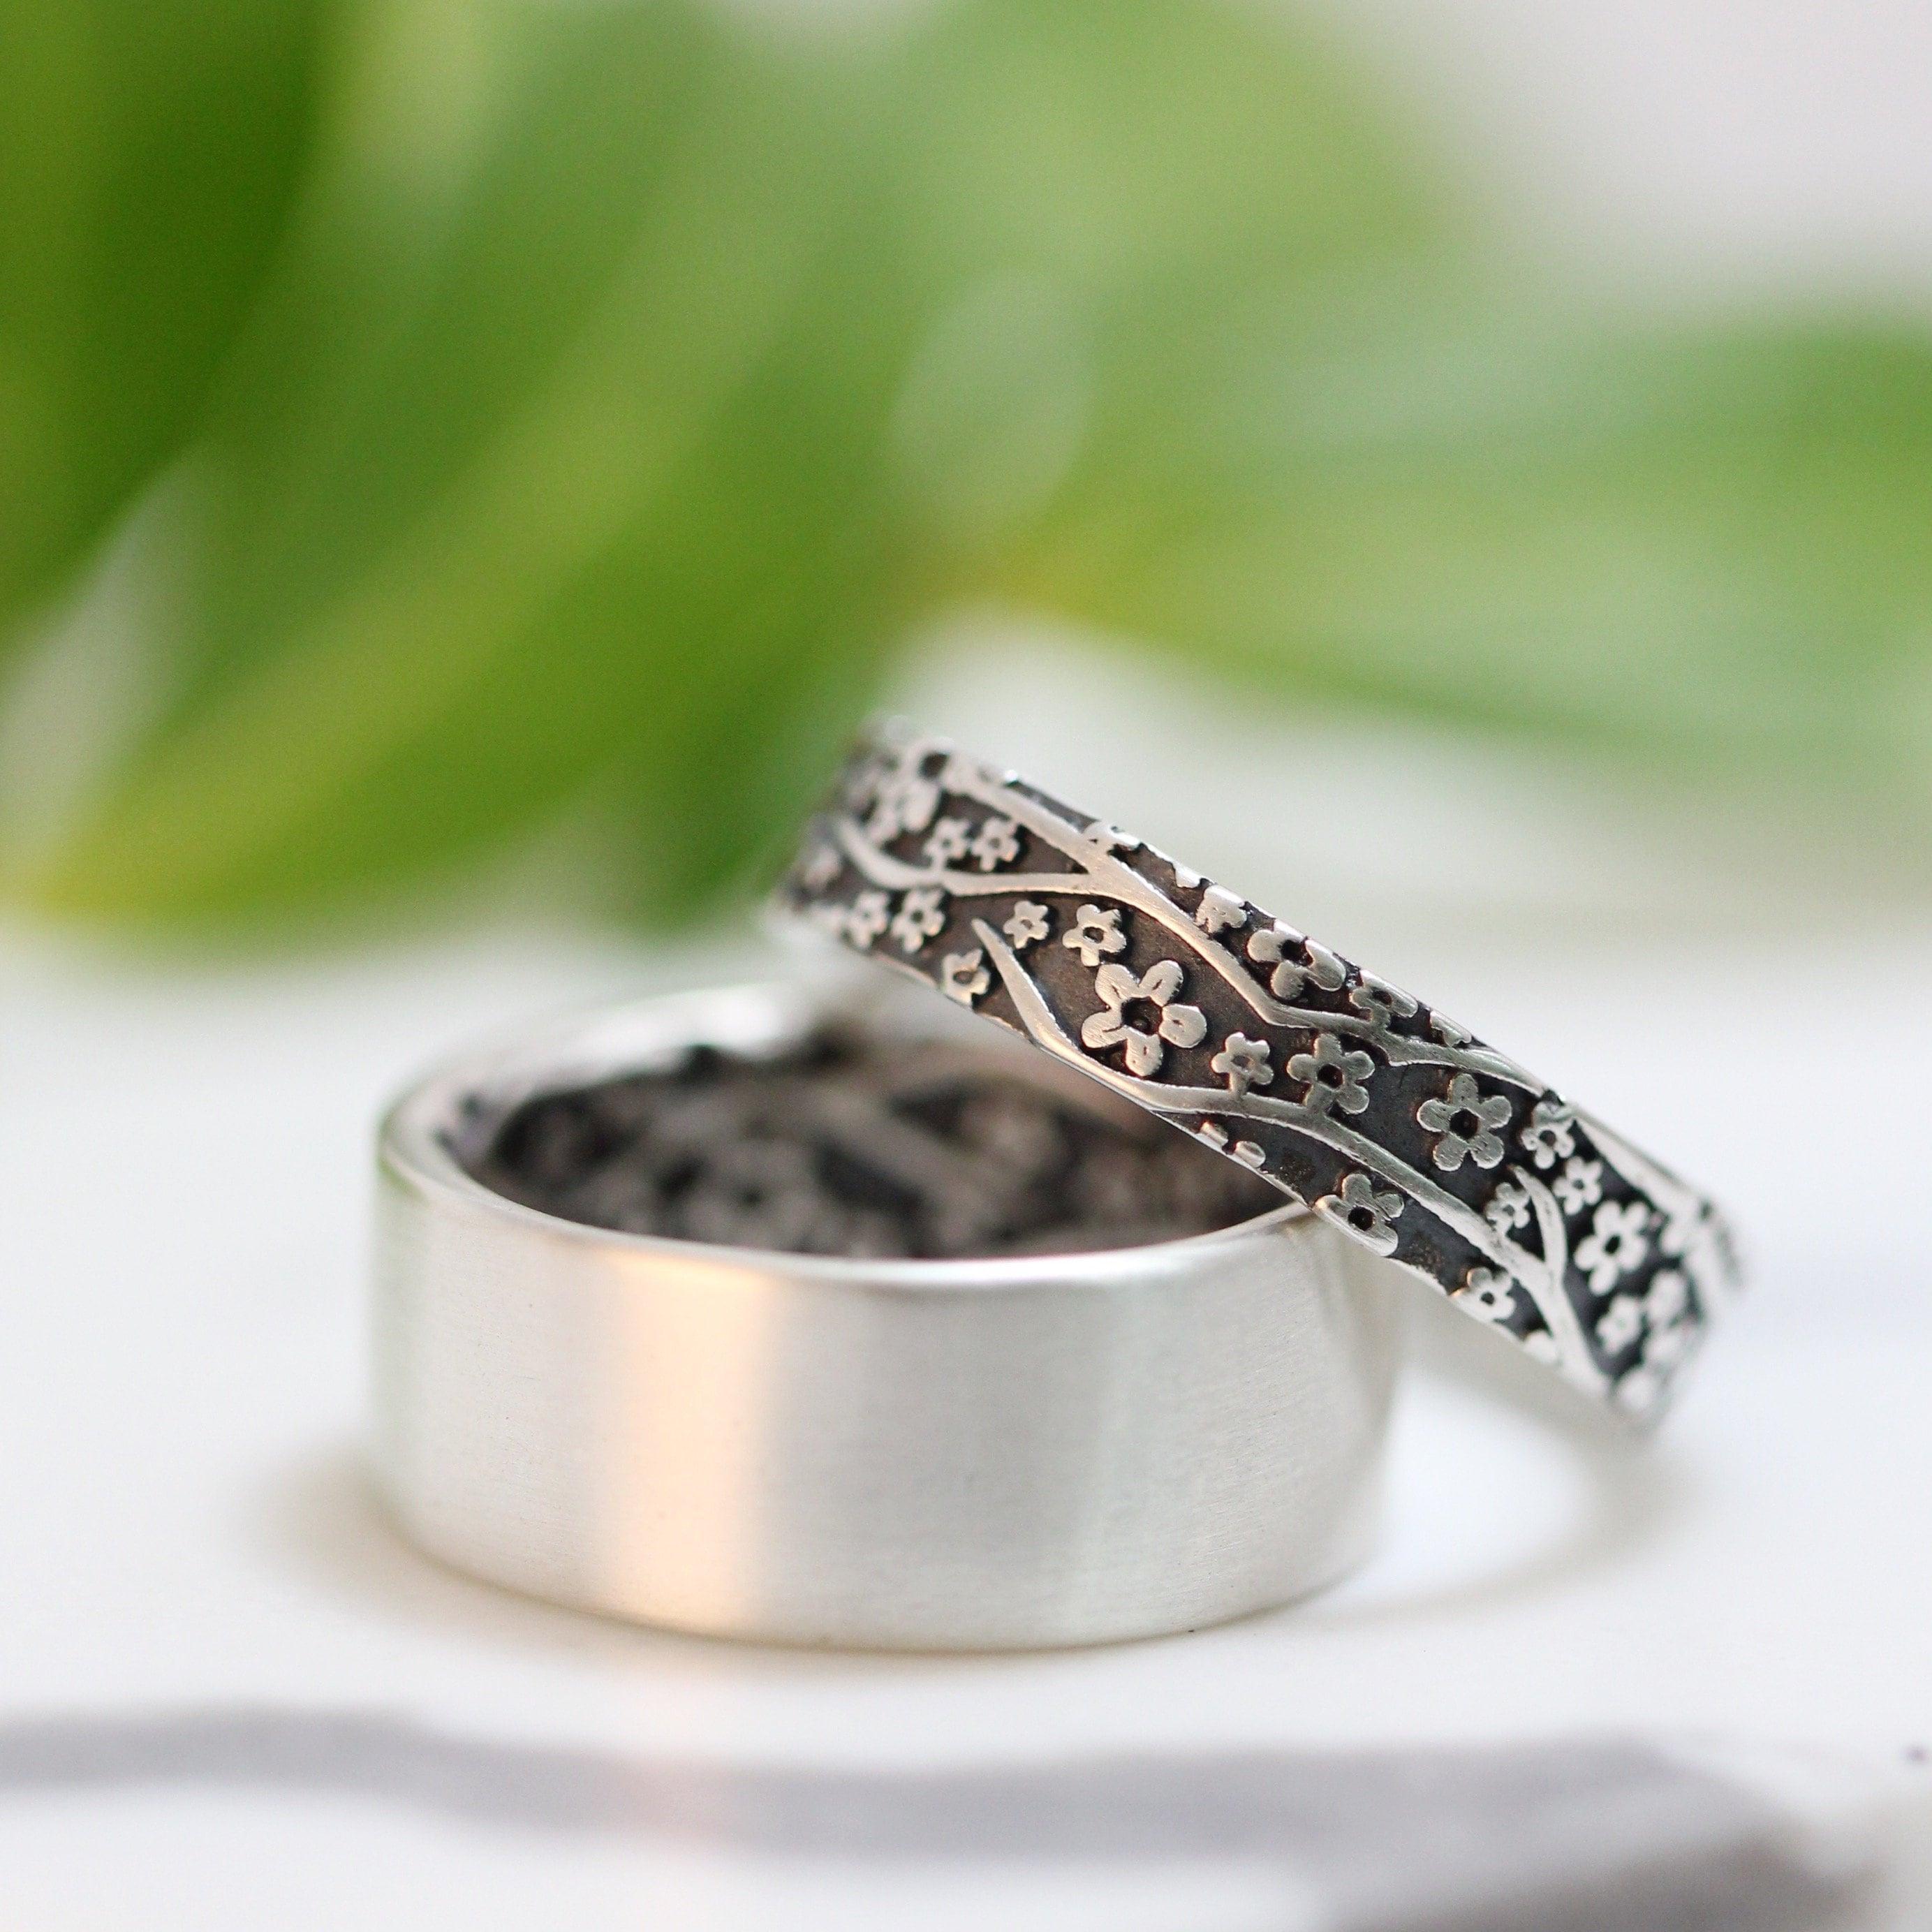 Womens Wedding Rings.Womens Wedding Ring Set Womens Wedding Band Set Cherry Blossom Silver Wedding Band Sterling Silver Mens Wedding Band Womens Wedding Ring